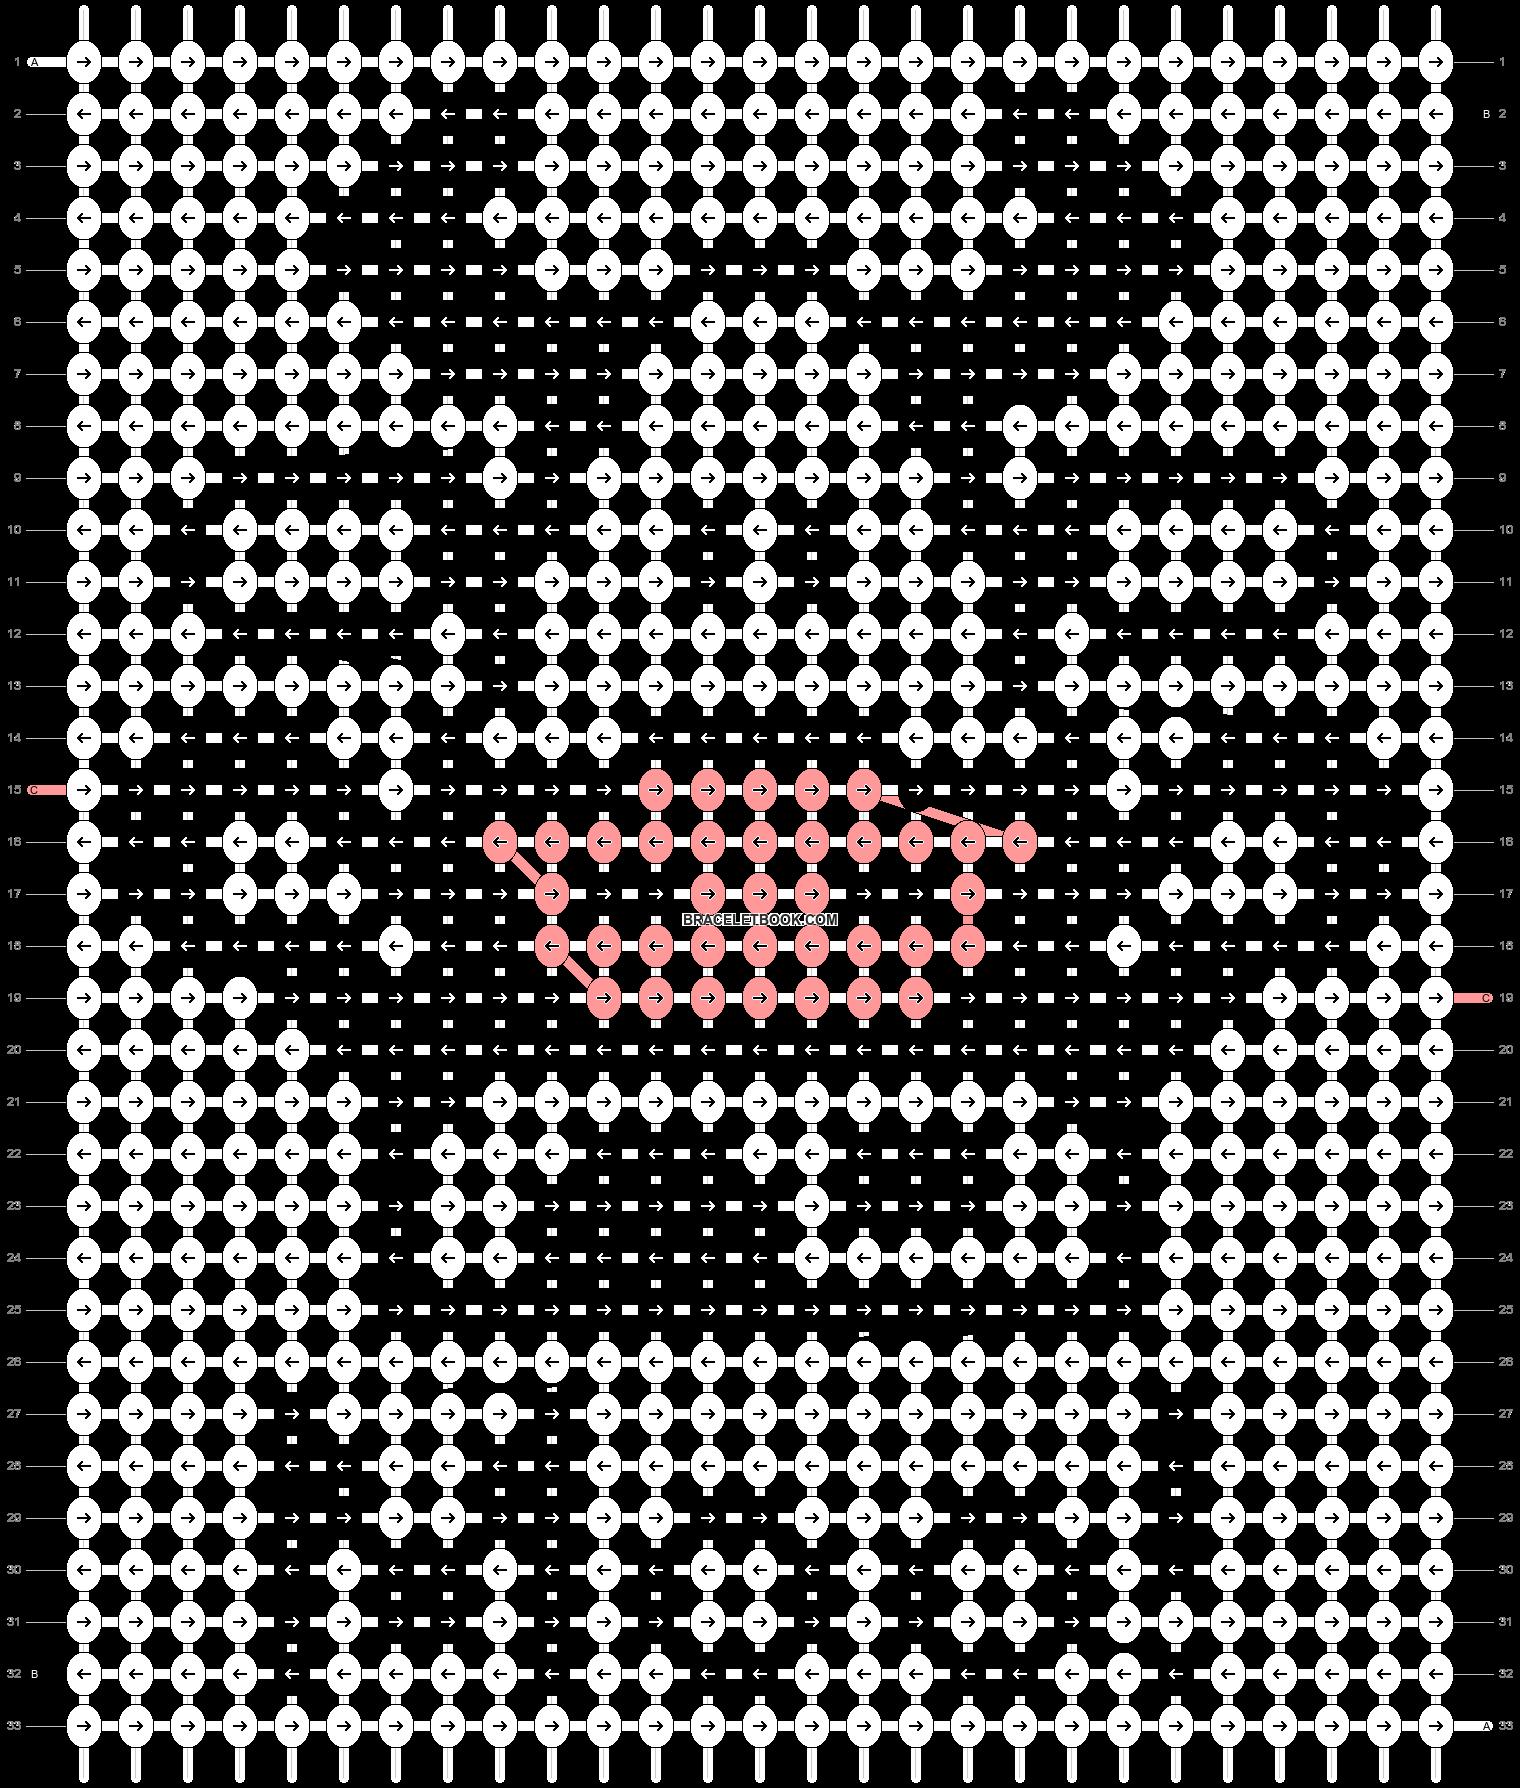 Alpha pattern #520 pattern